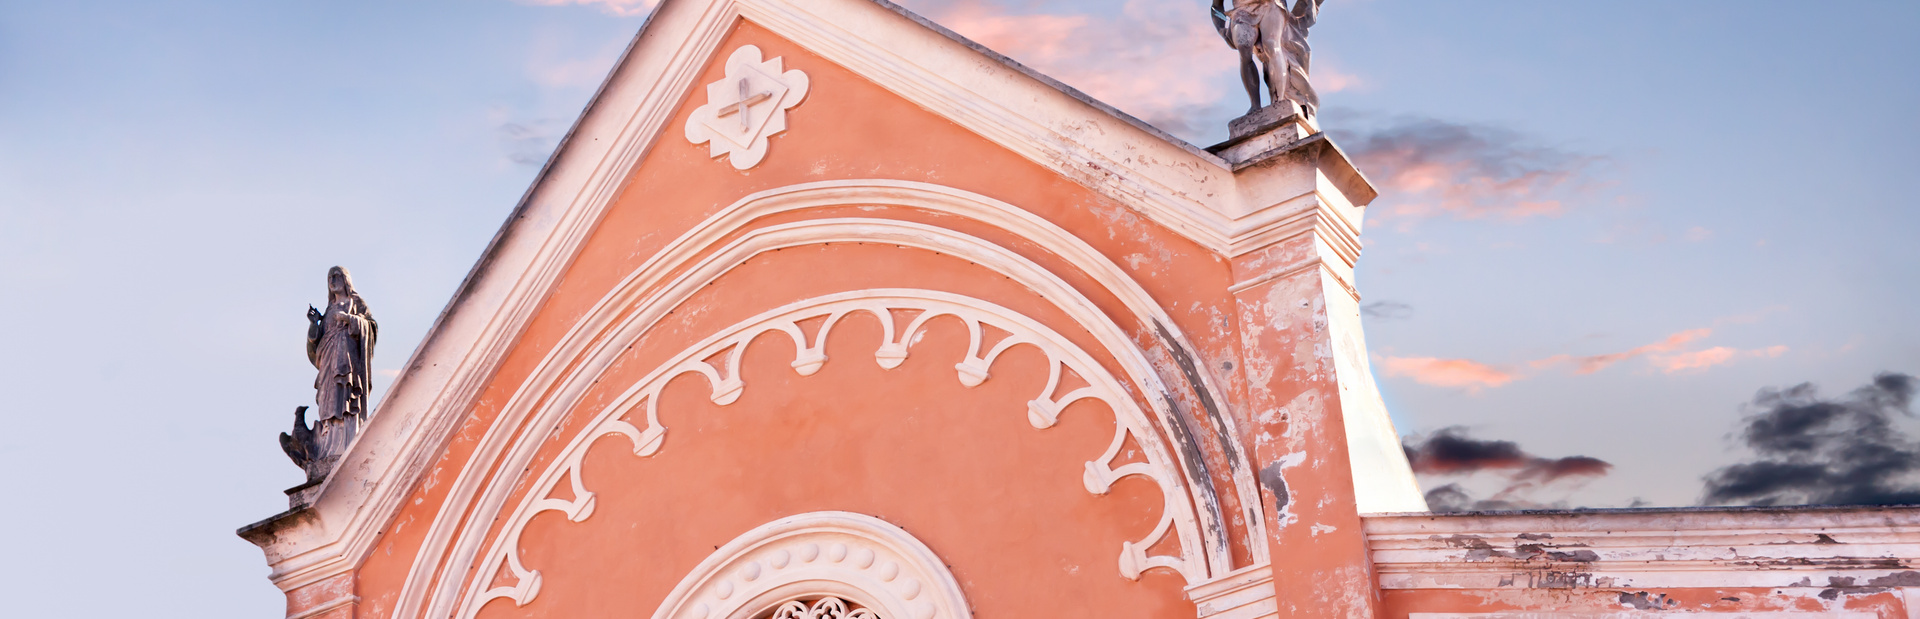 Elba news photo